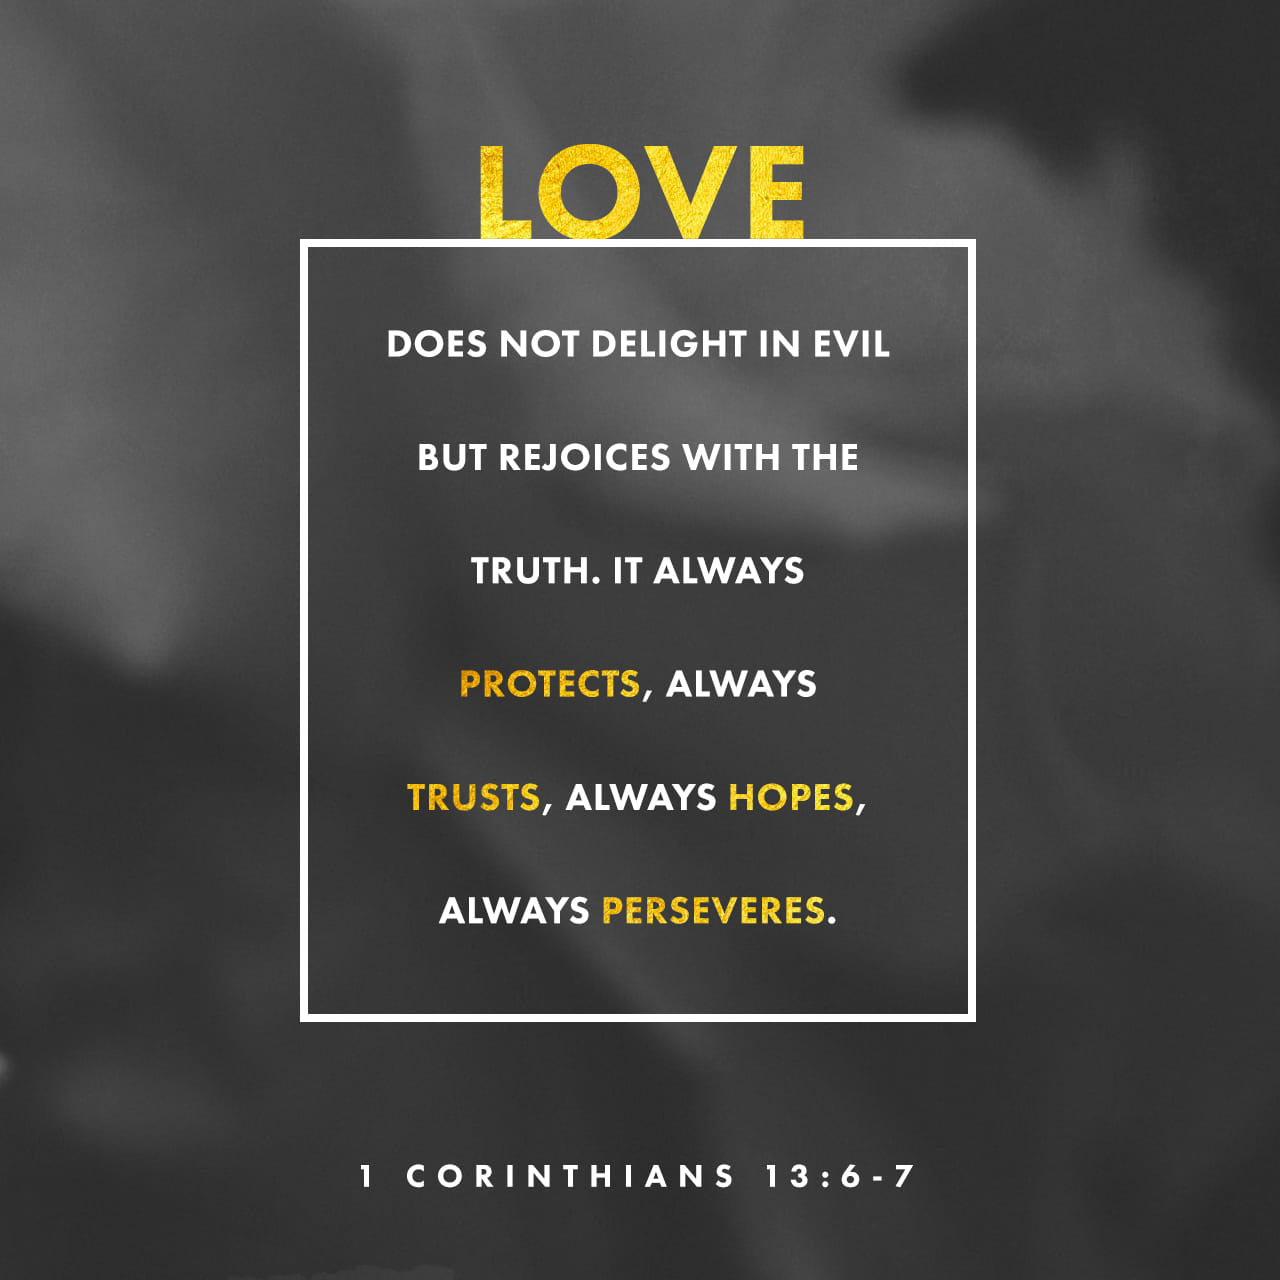 67bacf63fe 1 Corinthians 13 7 It always protects